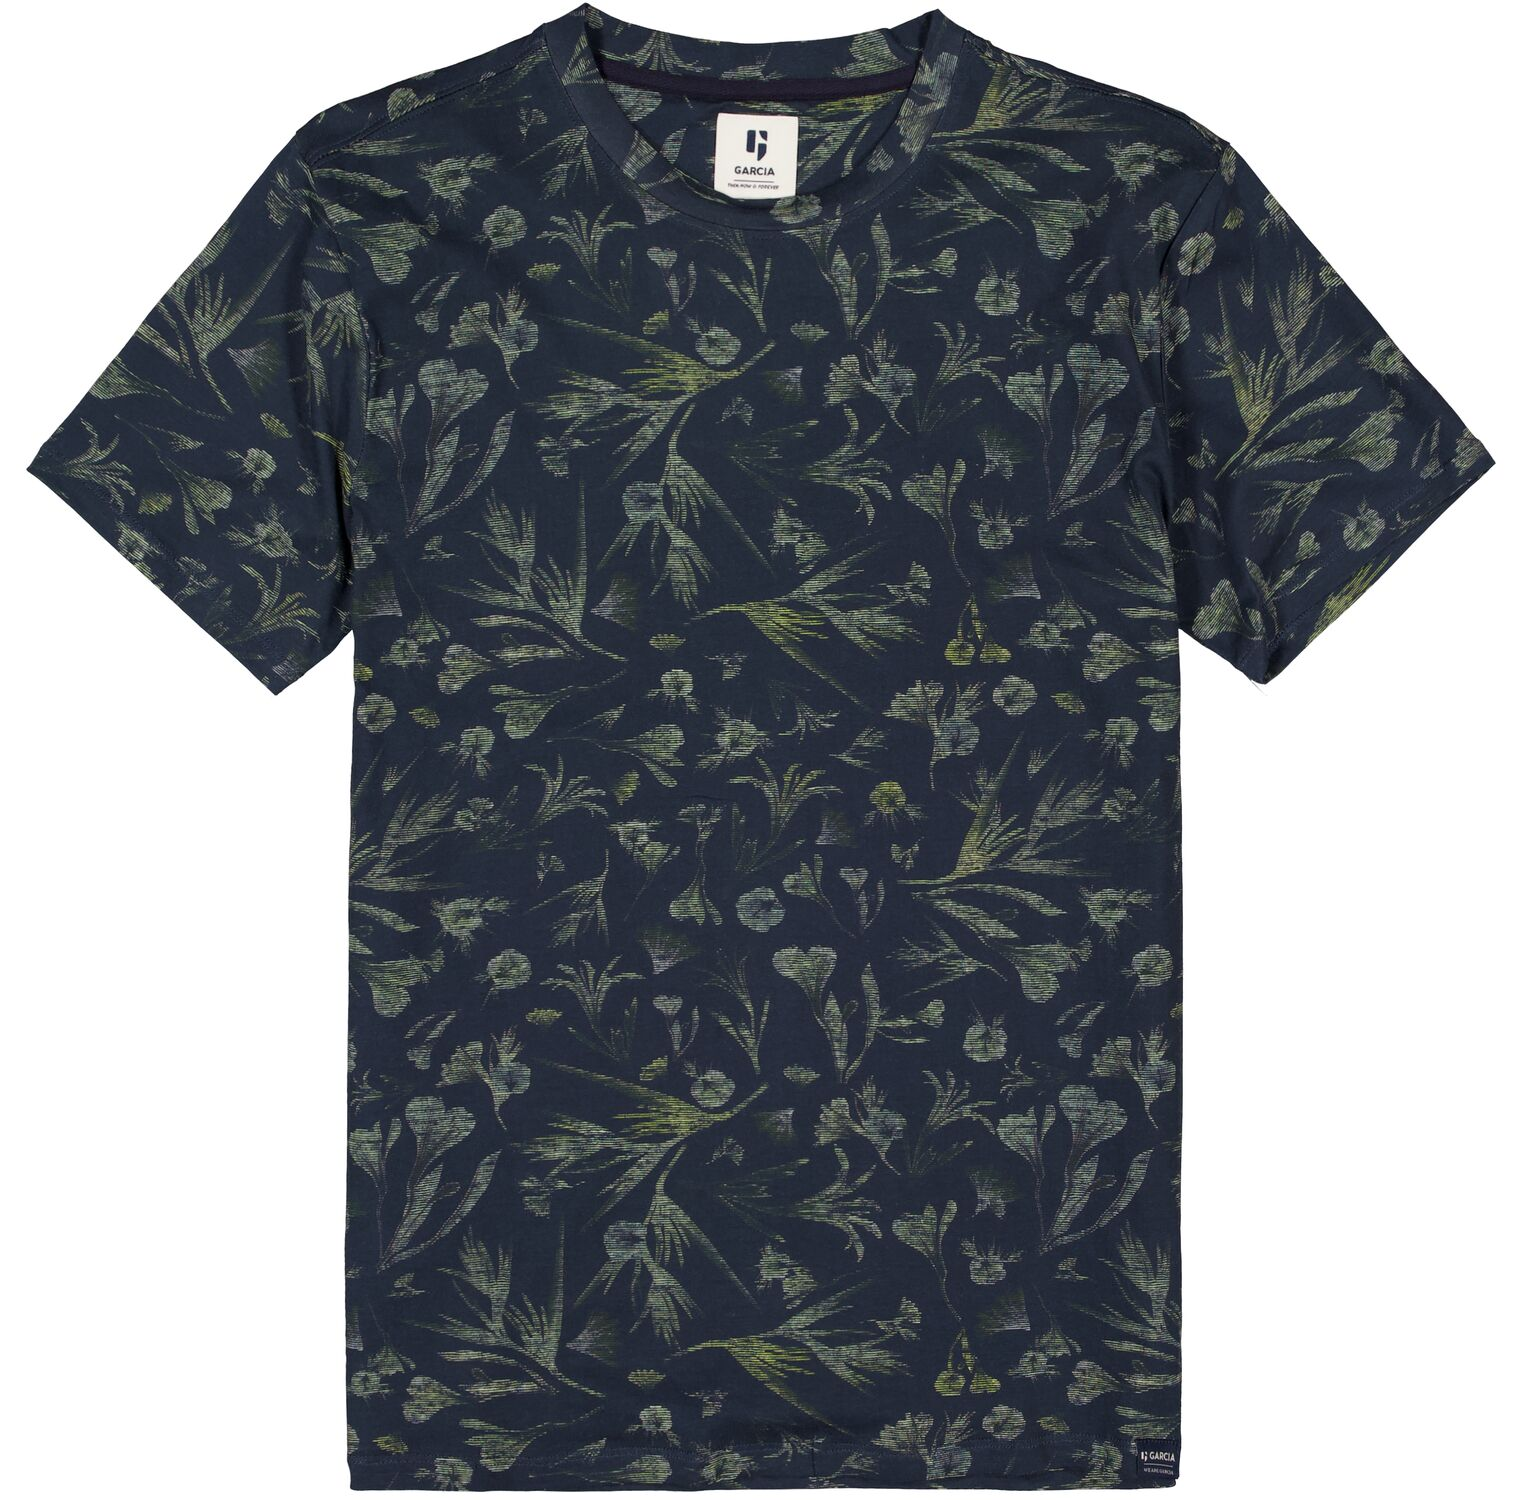 T-shirt ανδρικό fullprint με στρογγυλή λαιμόκοψη Garcia Jeans (C11004-292-DARK-MOON-BLUE)